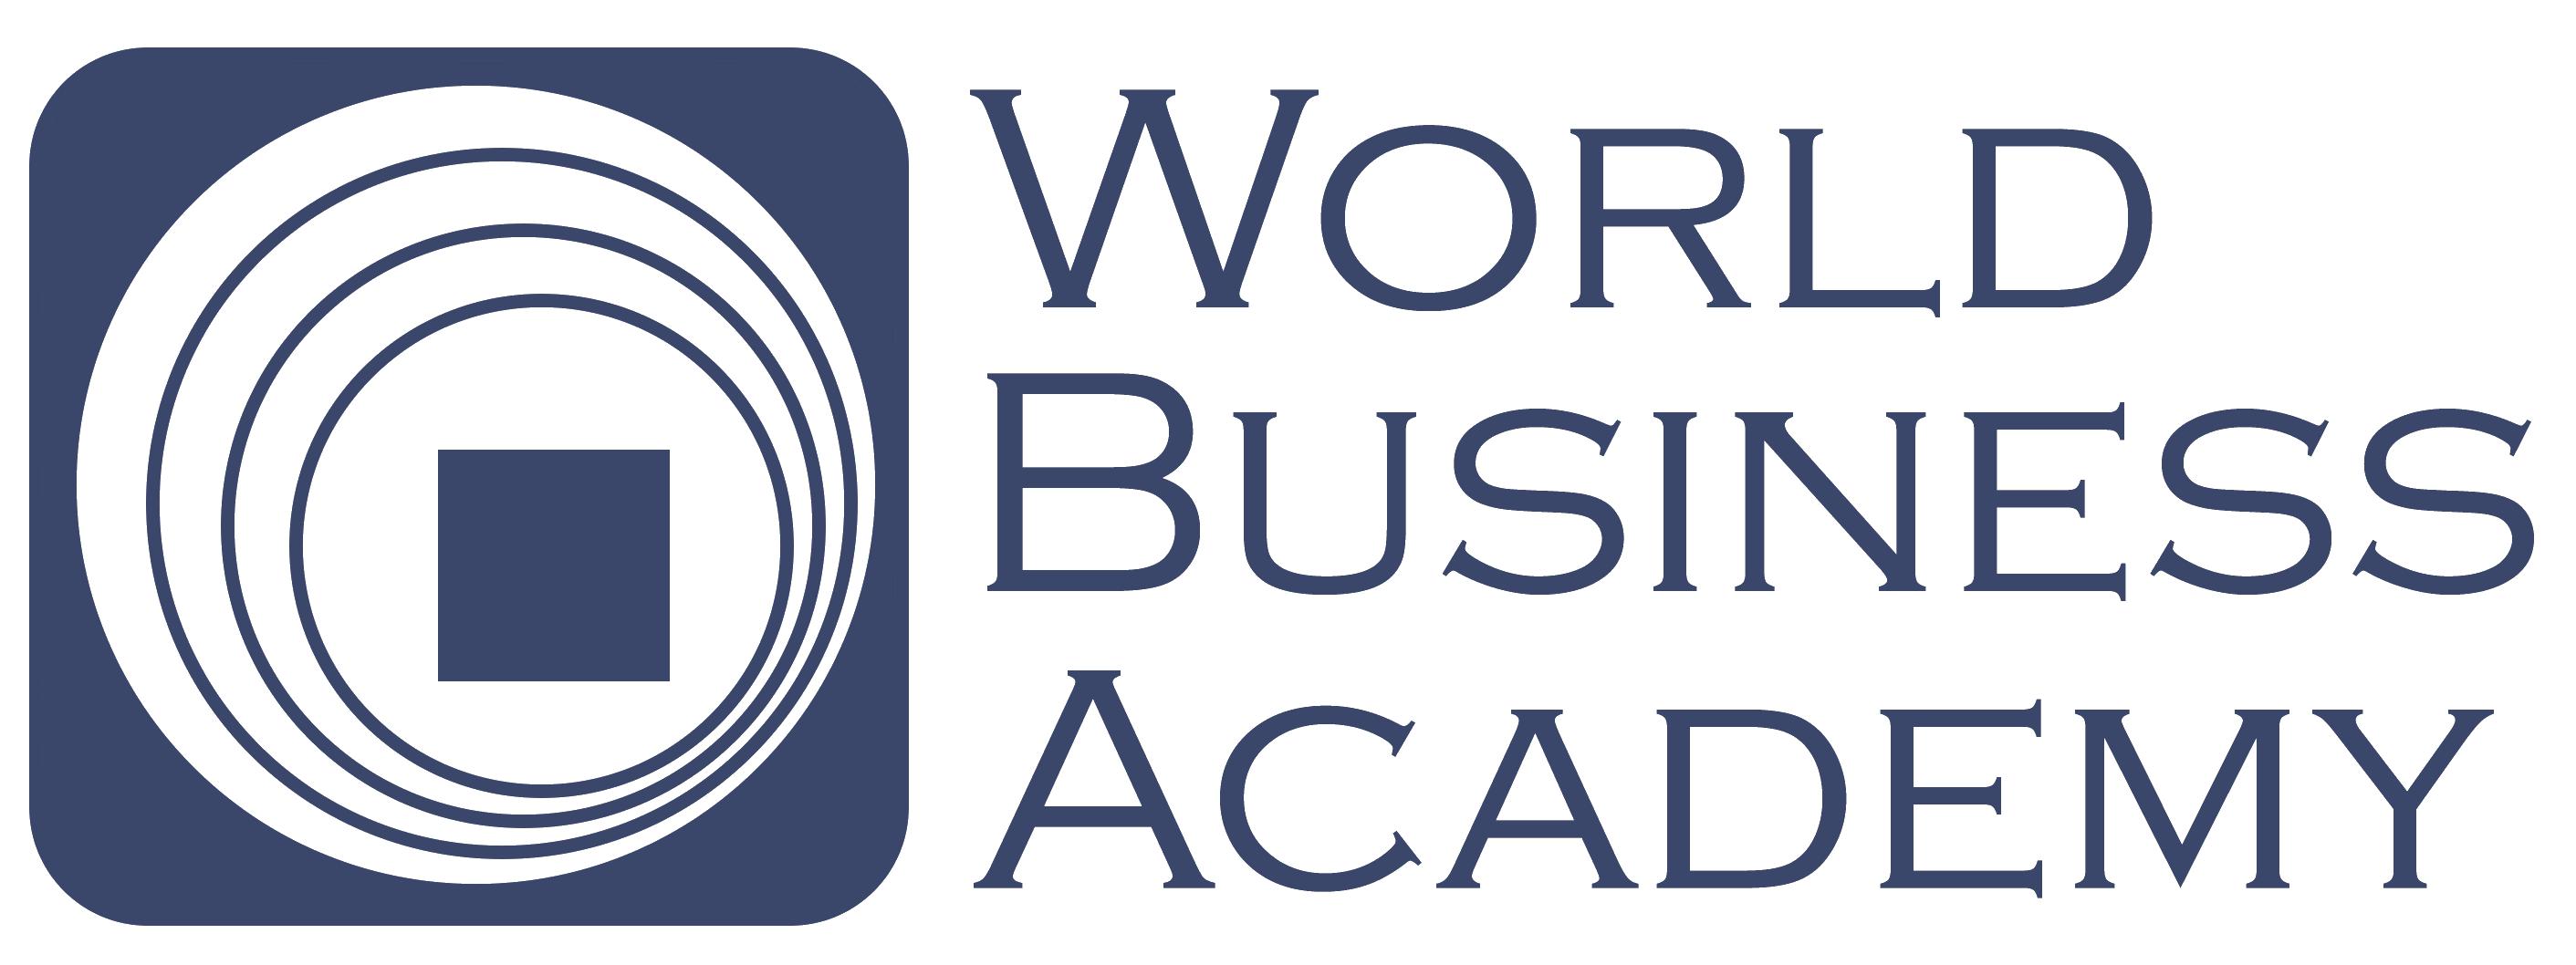 Academy-Logo-Vertical